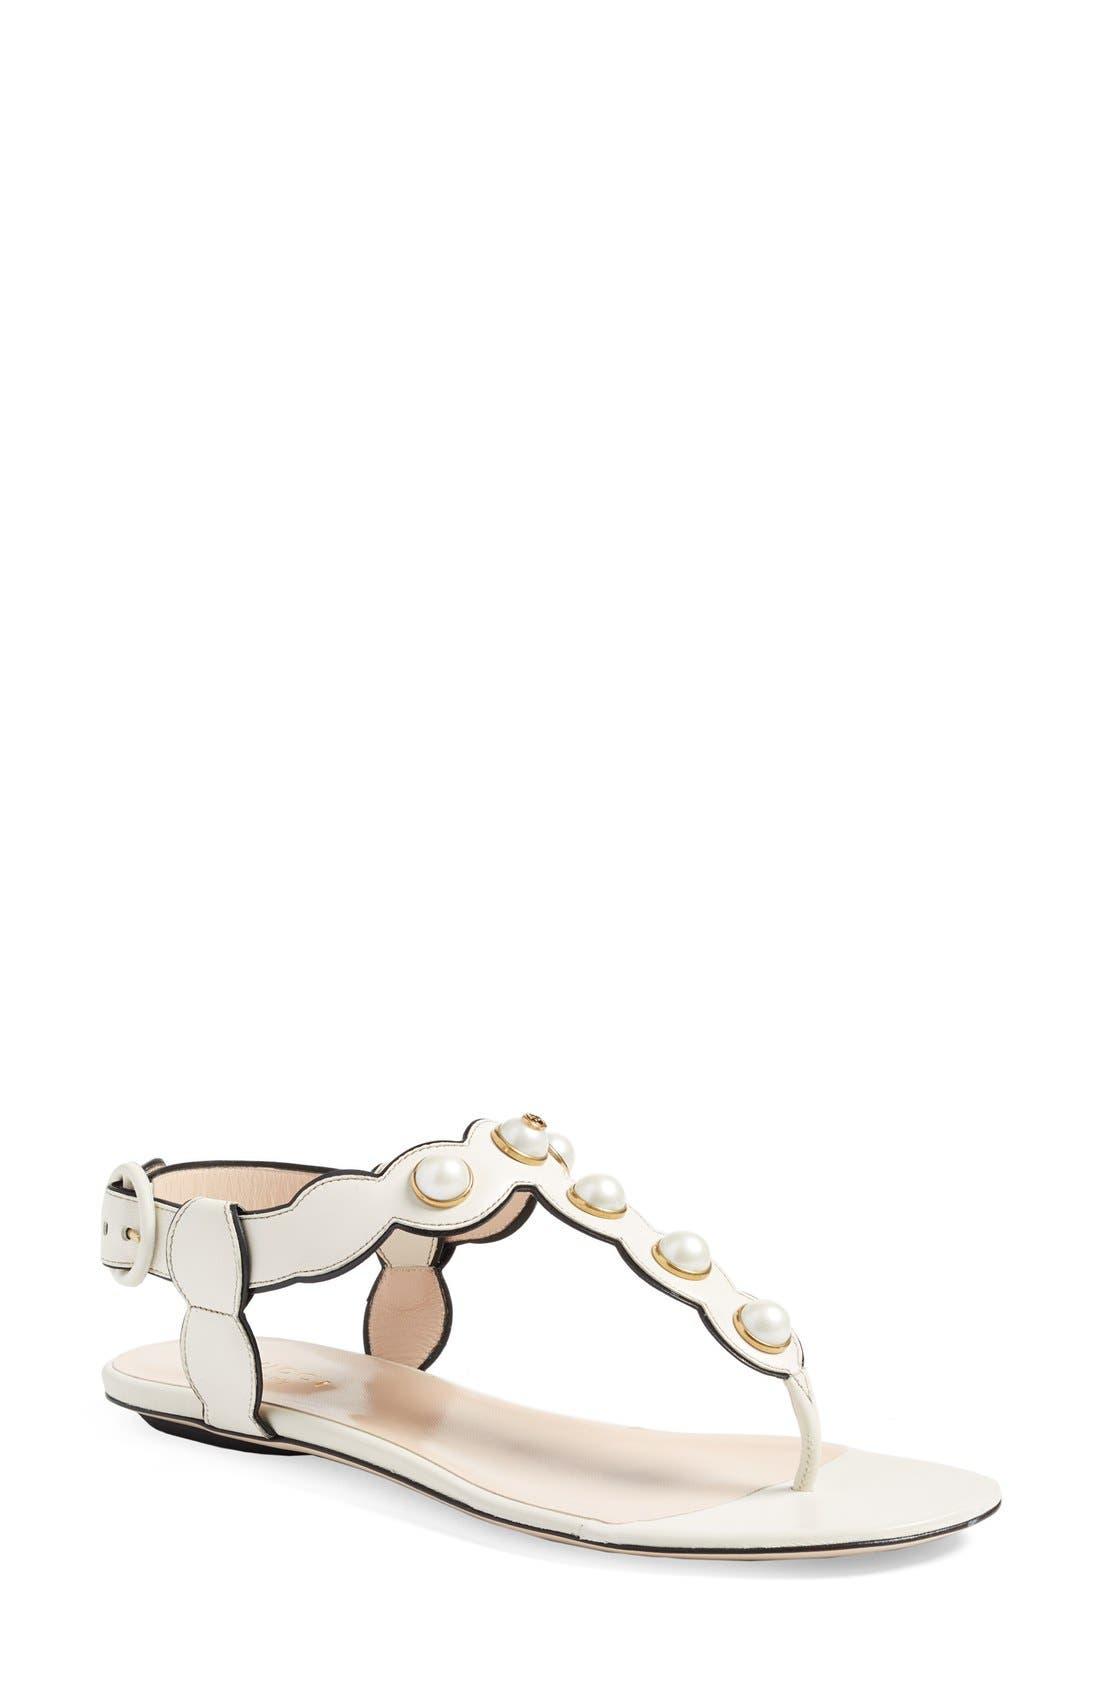 Alternate Image 1 Selected - Gucci 'Willow' Thong Sandal (Women)